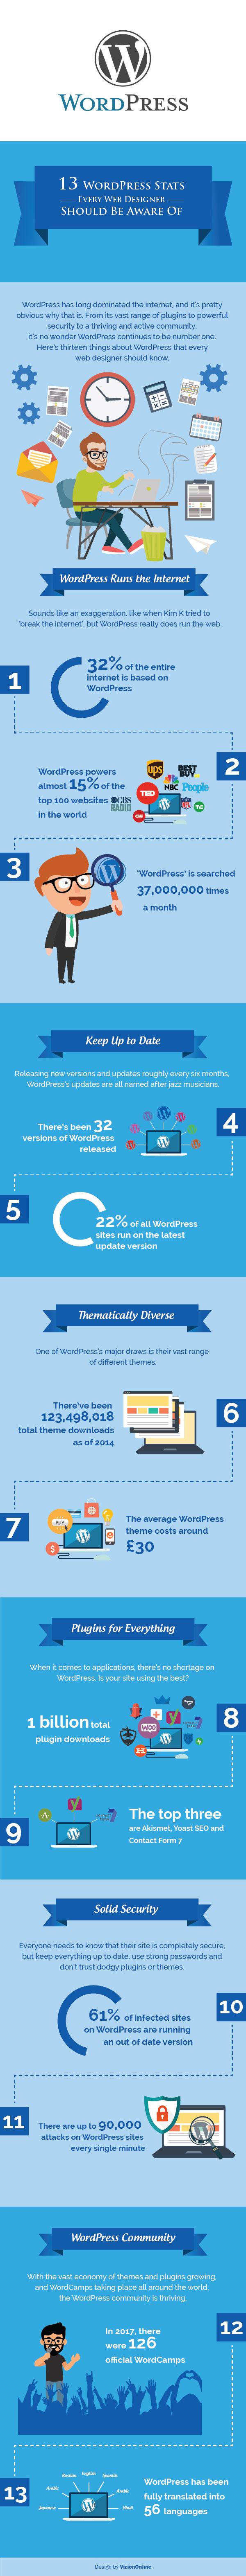 13 WordPress Stats Every Web Designer Should be Aware Of